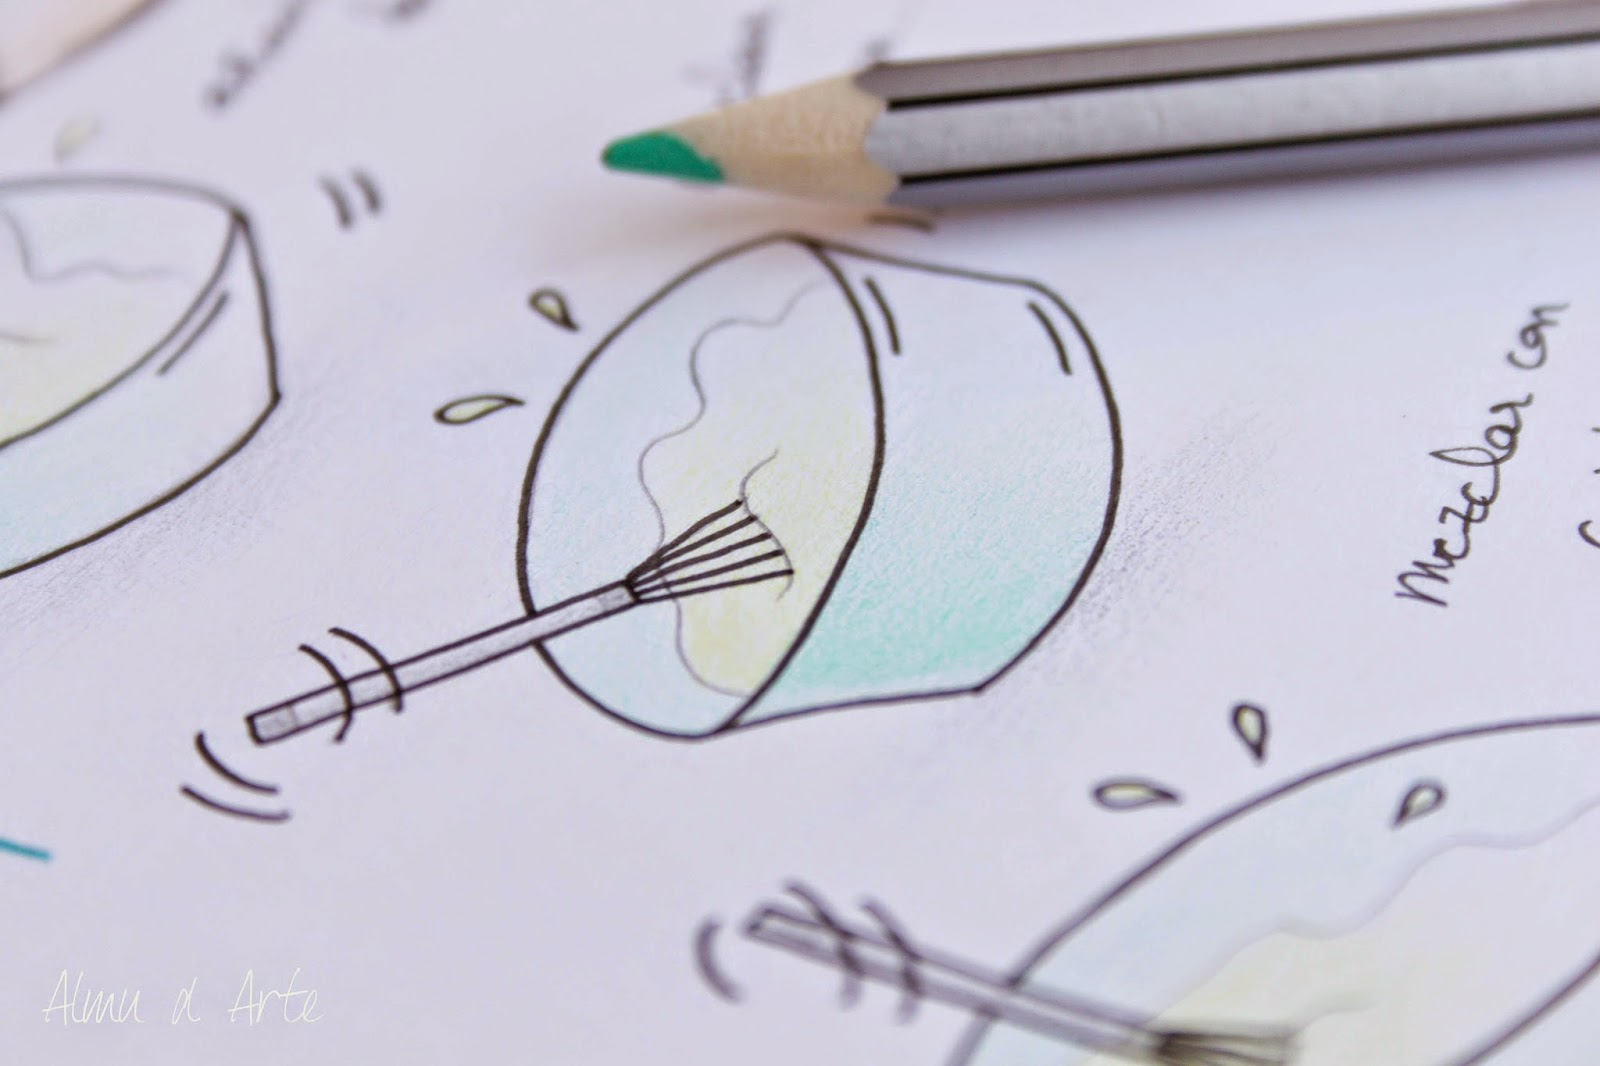 Dibujo para ilustrar una receta